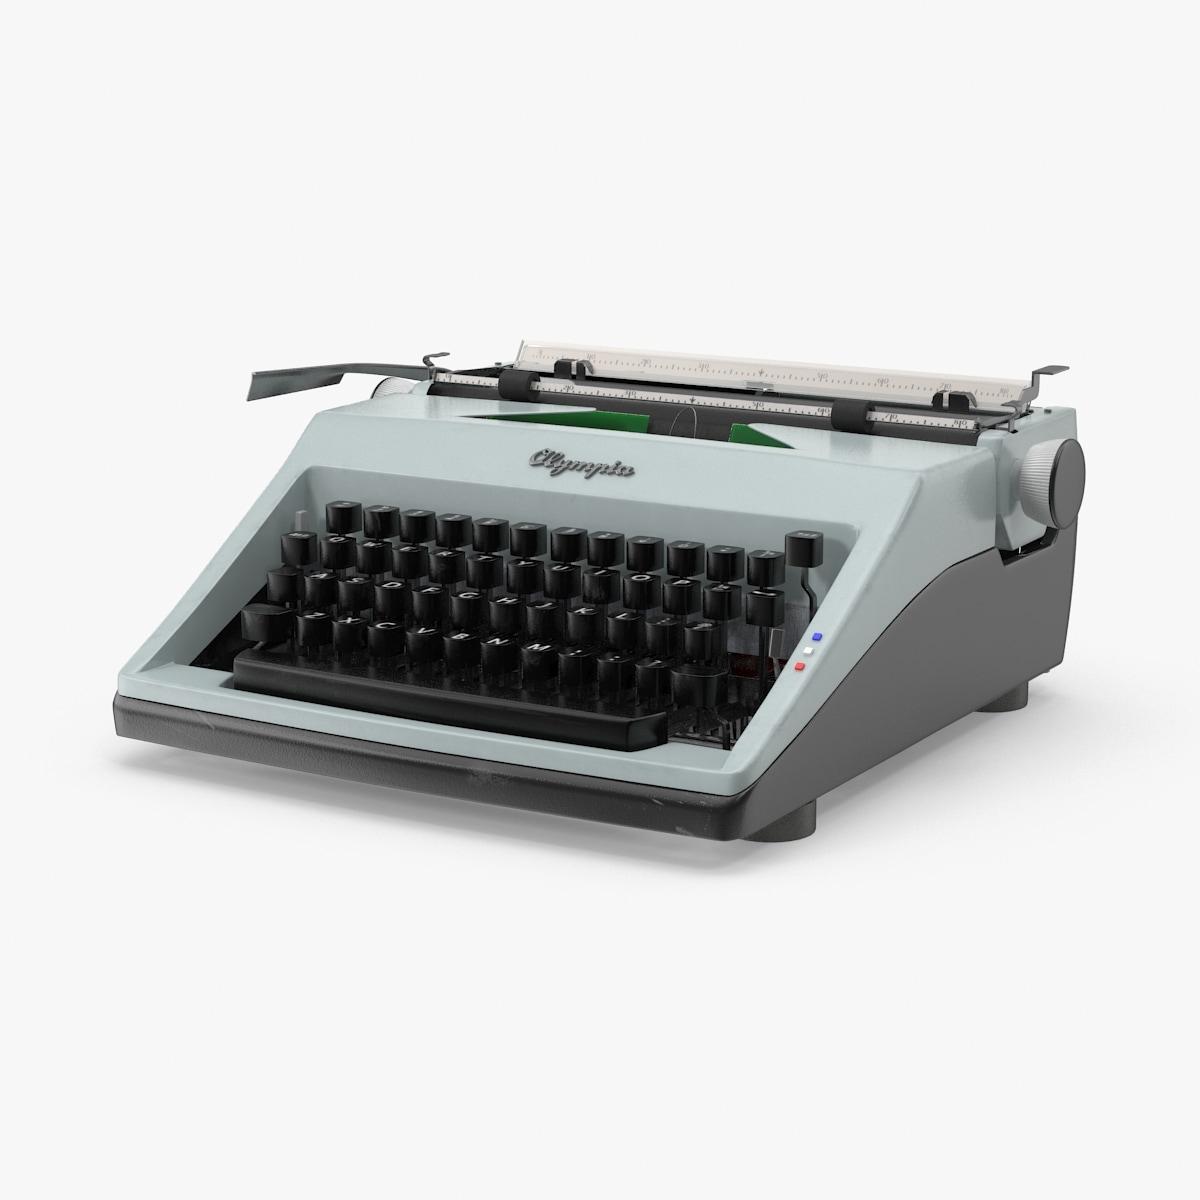 3d model olympia typewriter